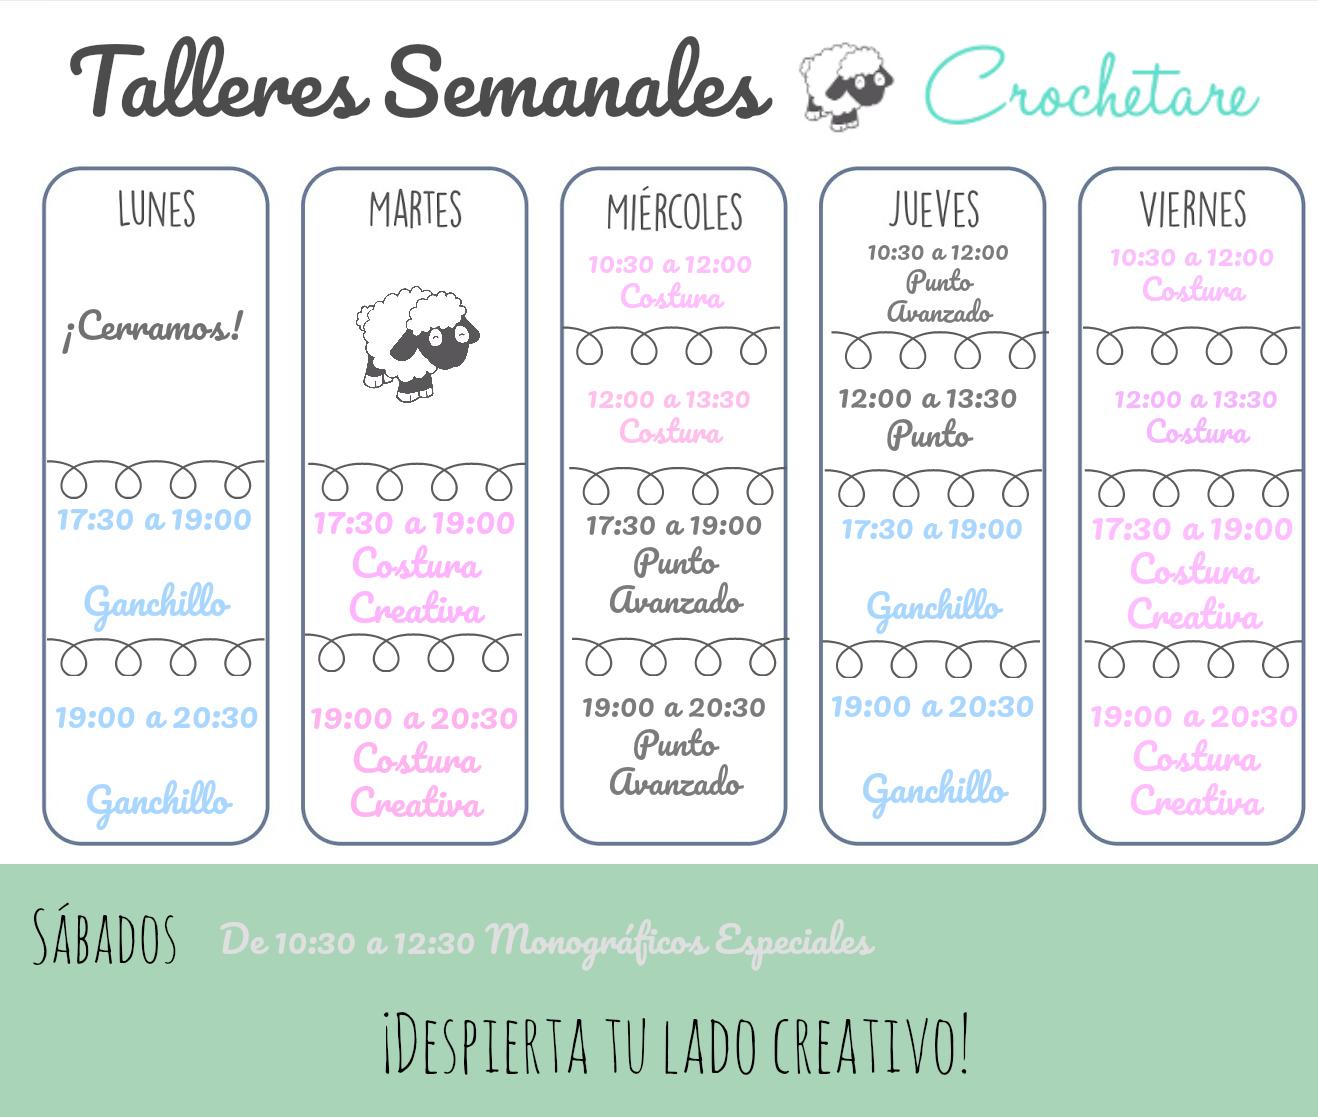 calendario semanal cursos y talleres crochetare